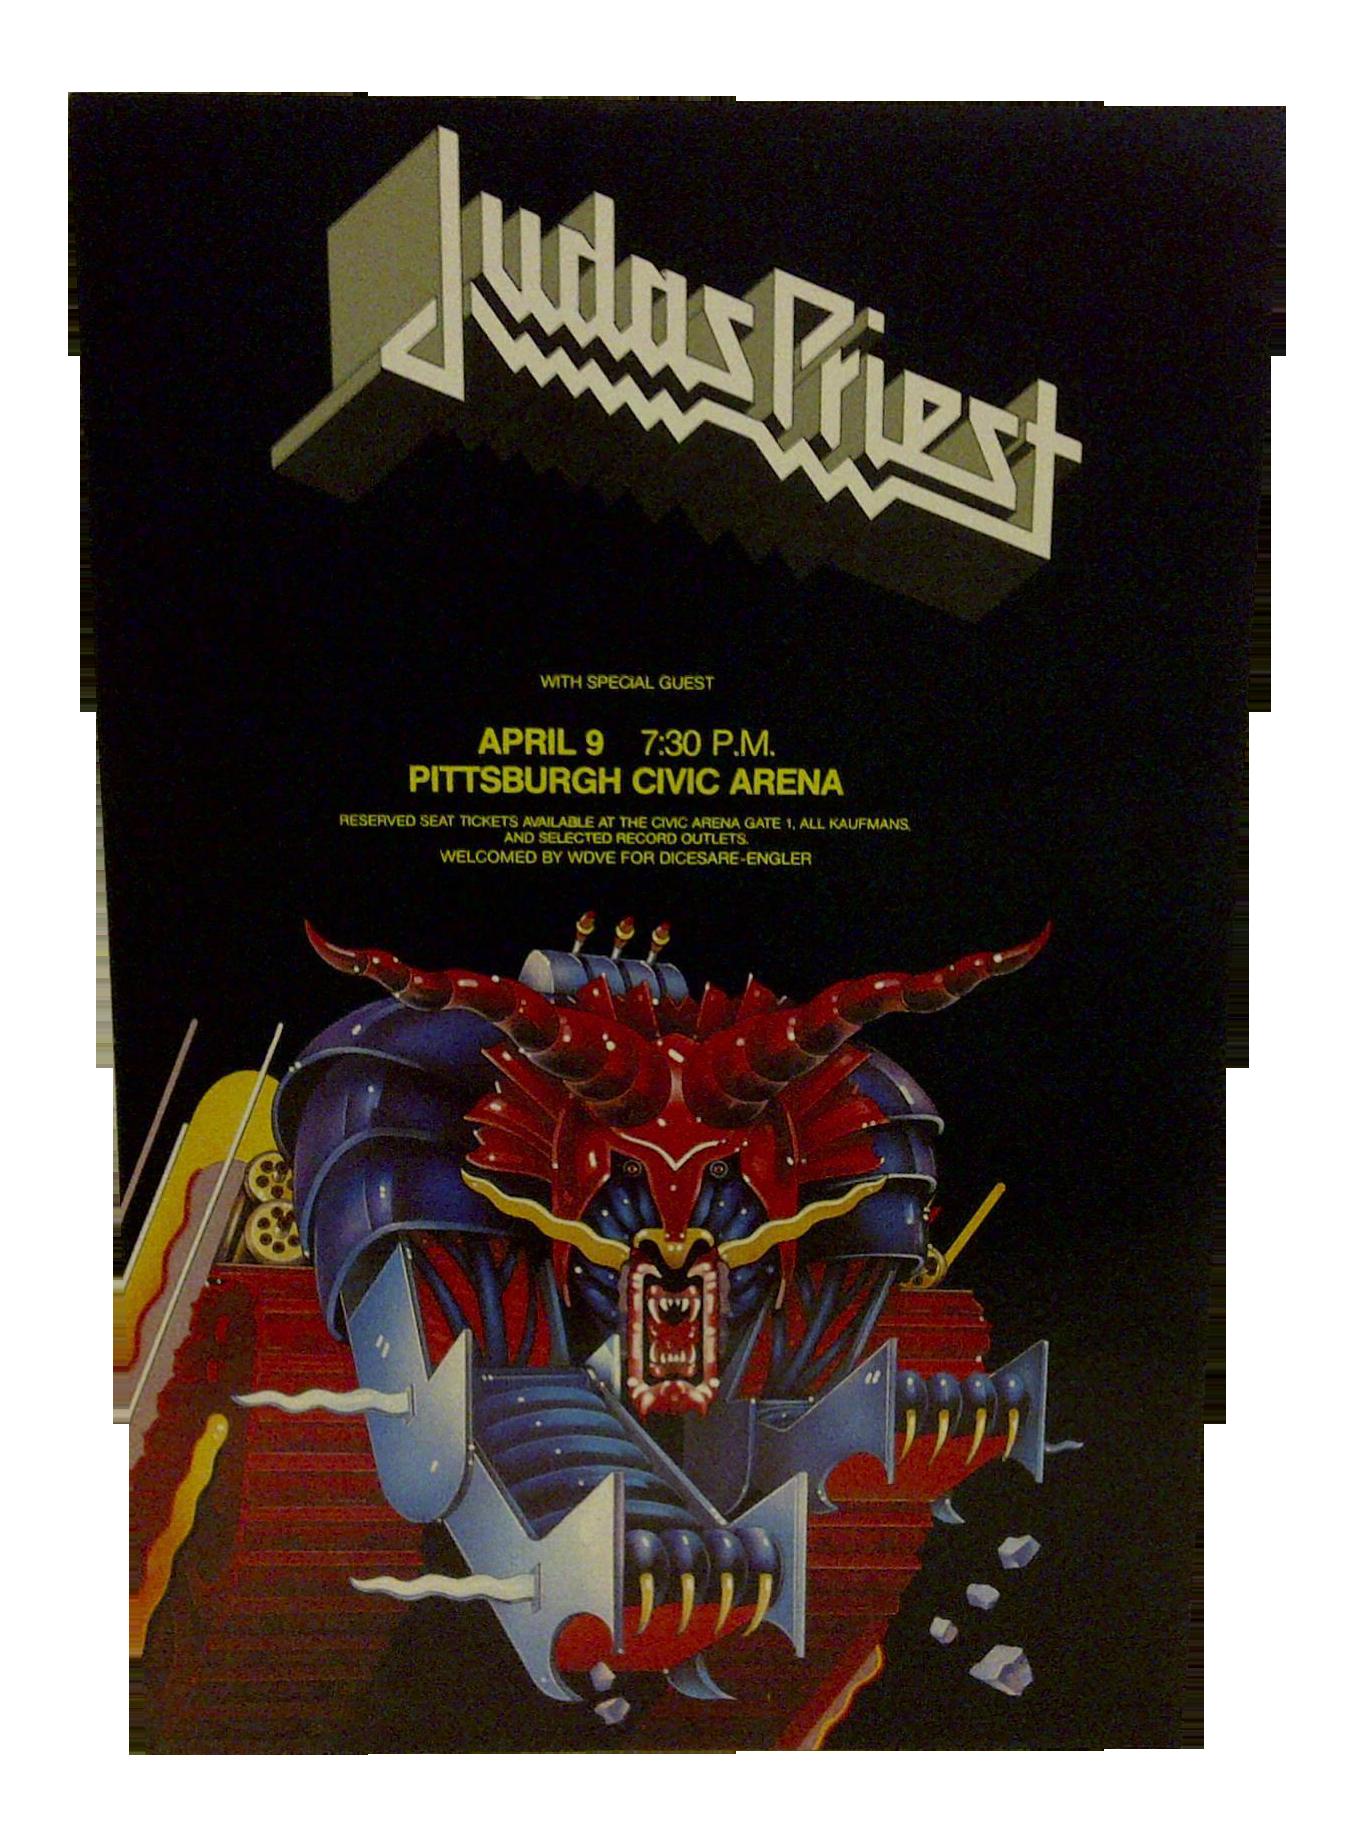 Judas Priest Concert Poster Pittsburgh 1984 Chairish